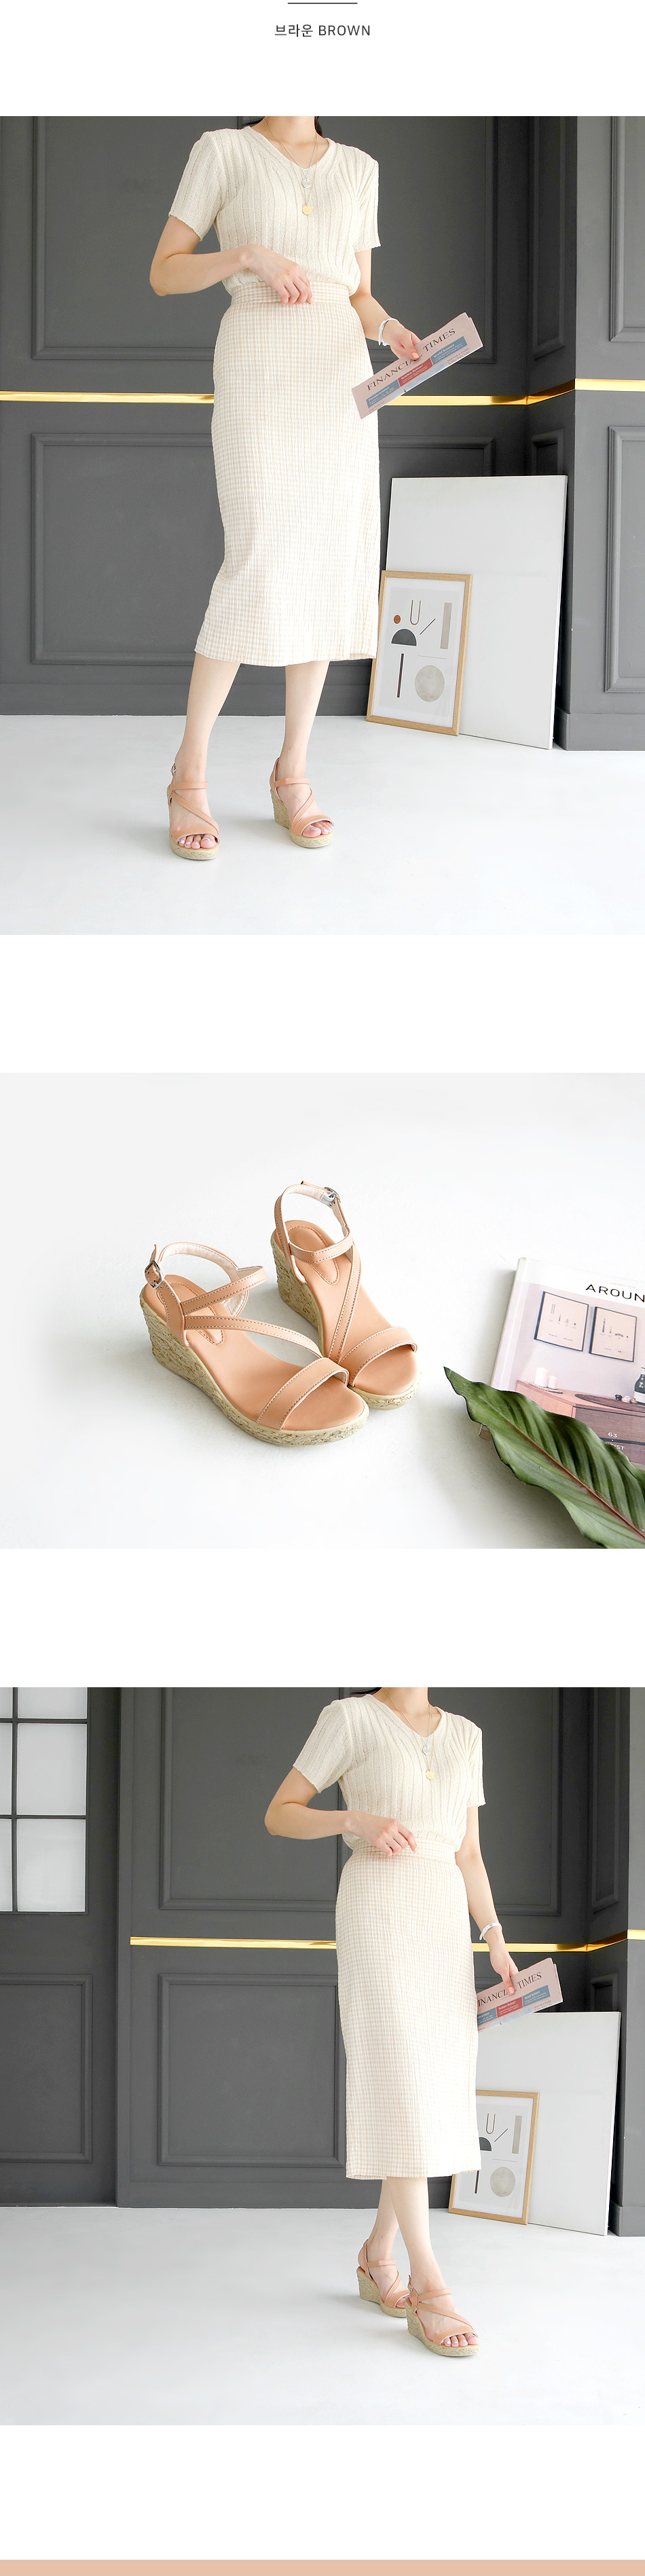 Juliea wedge slingback sandals 7 cm